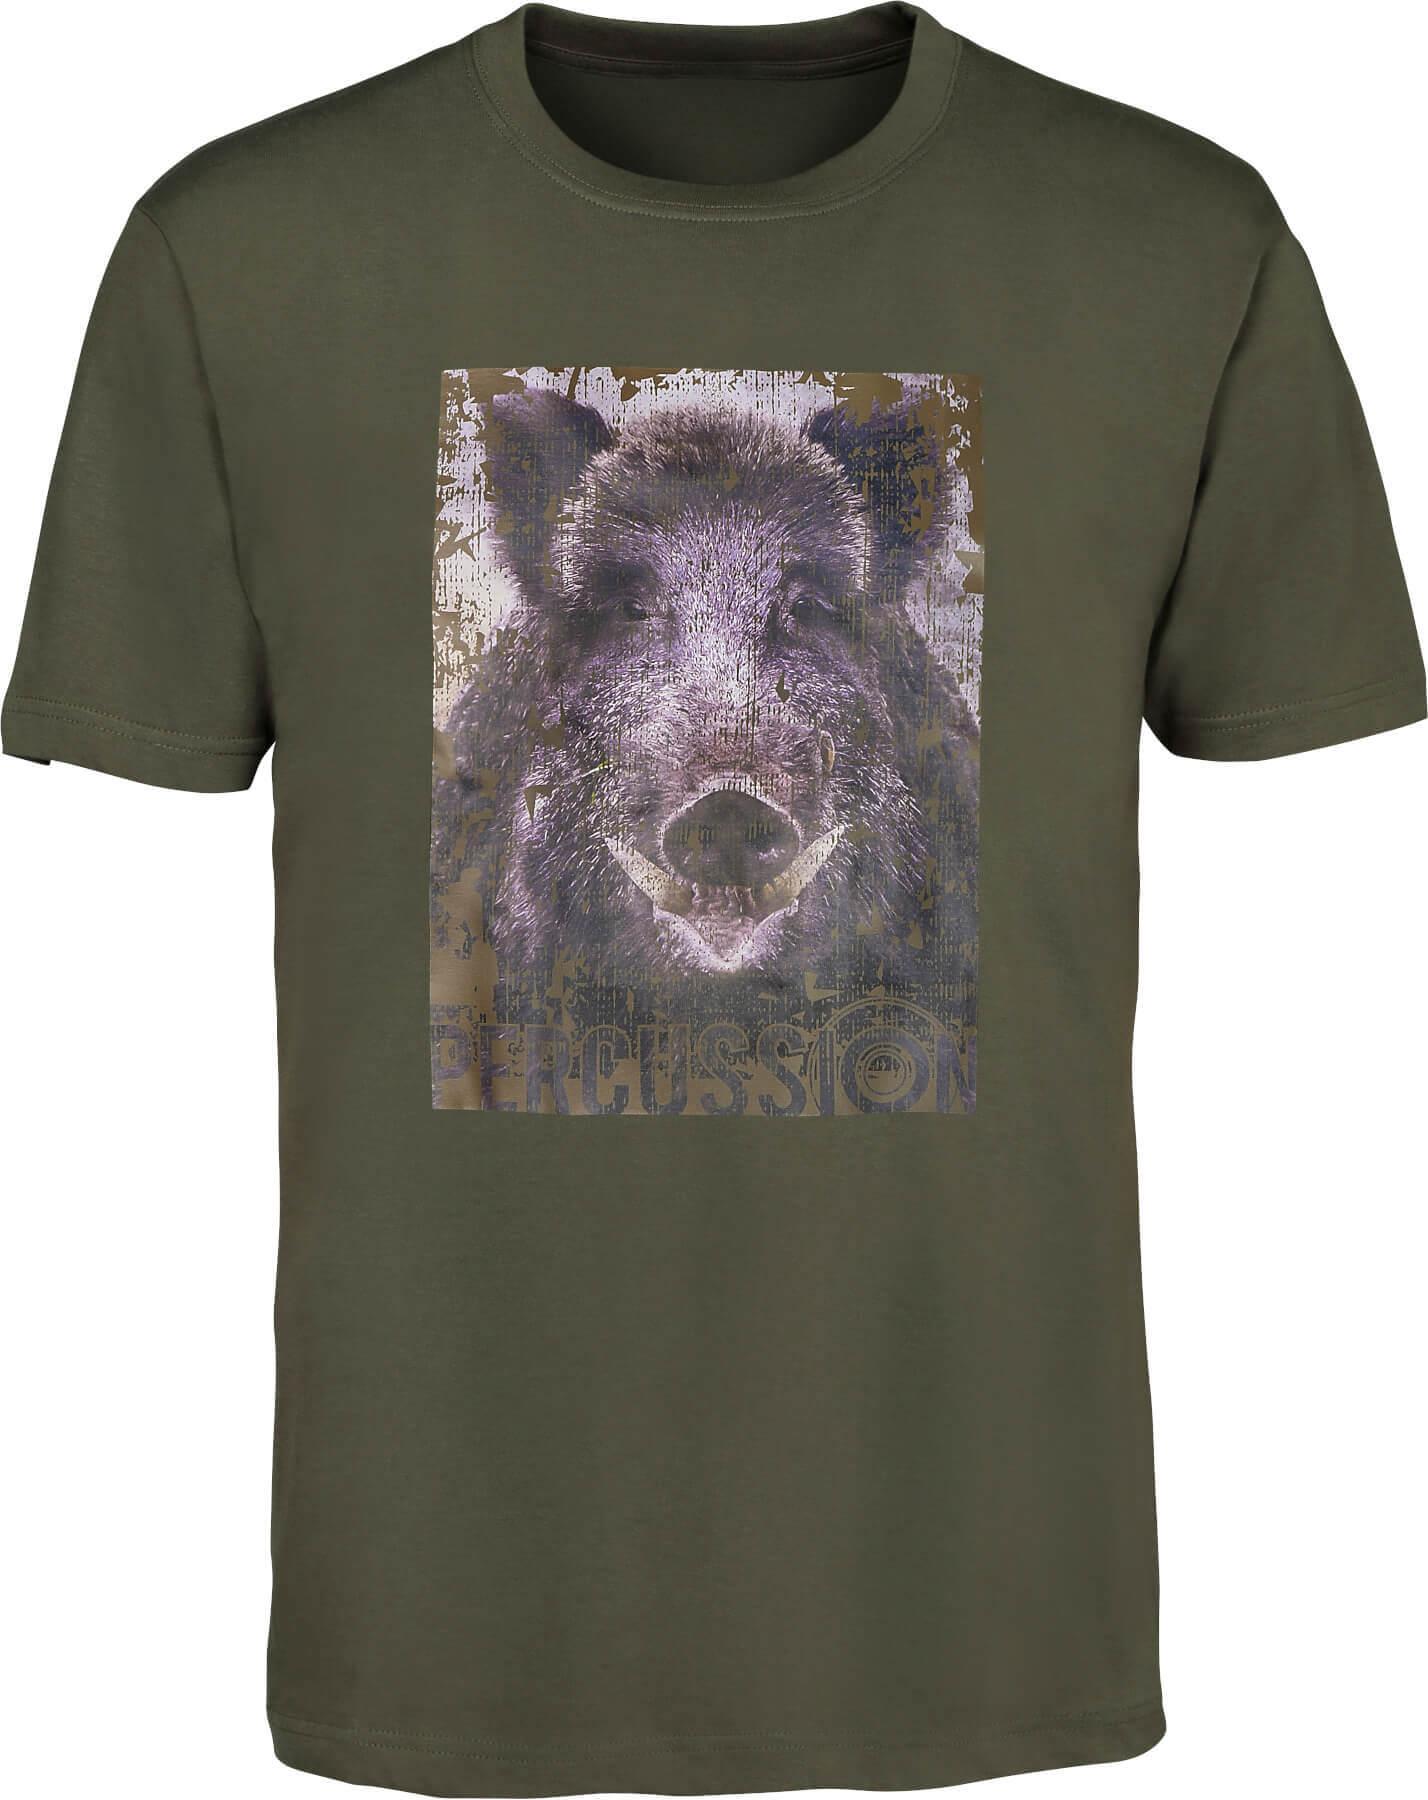 "T-Shirt ""Wildboar Kids"""